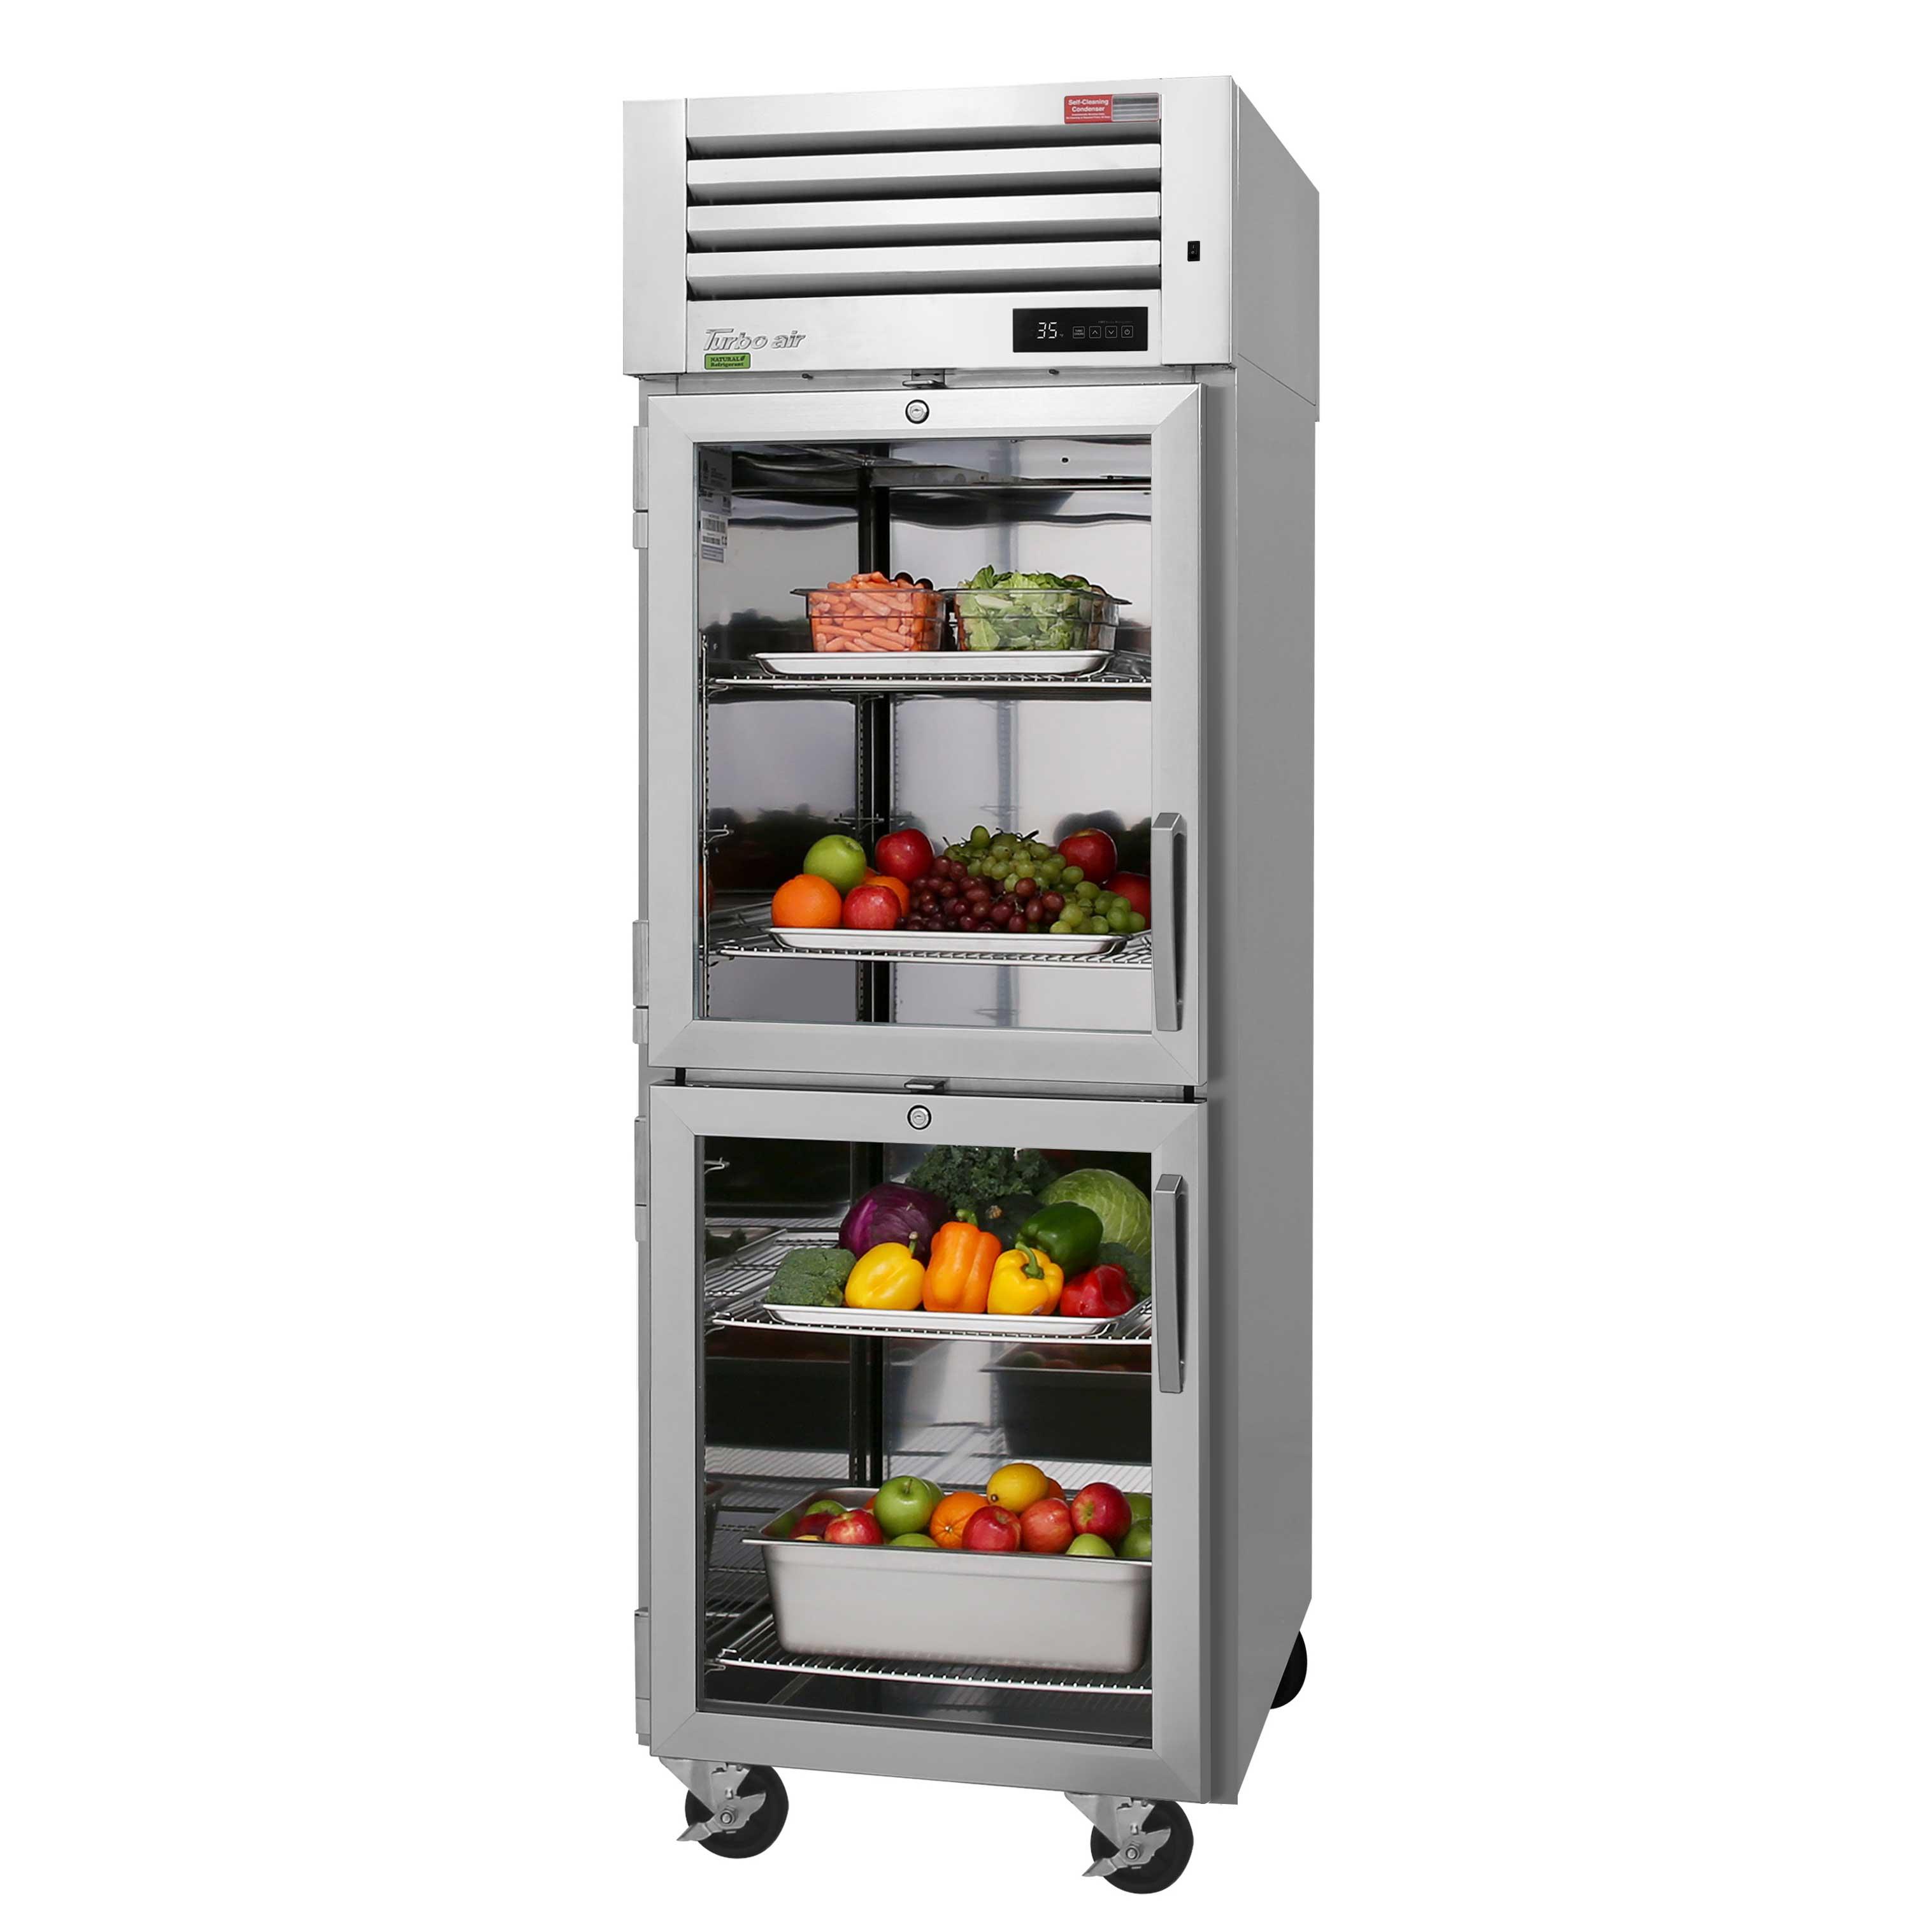 Turbo Air PRO-26-2R-GS-PT-N refrigerator, pass-thru